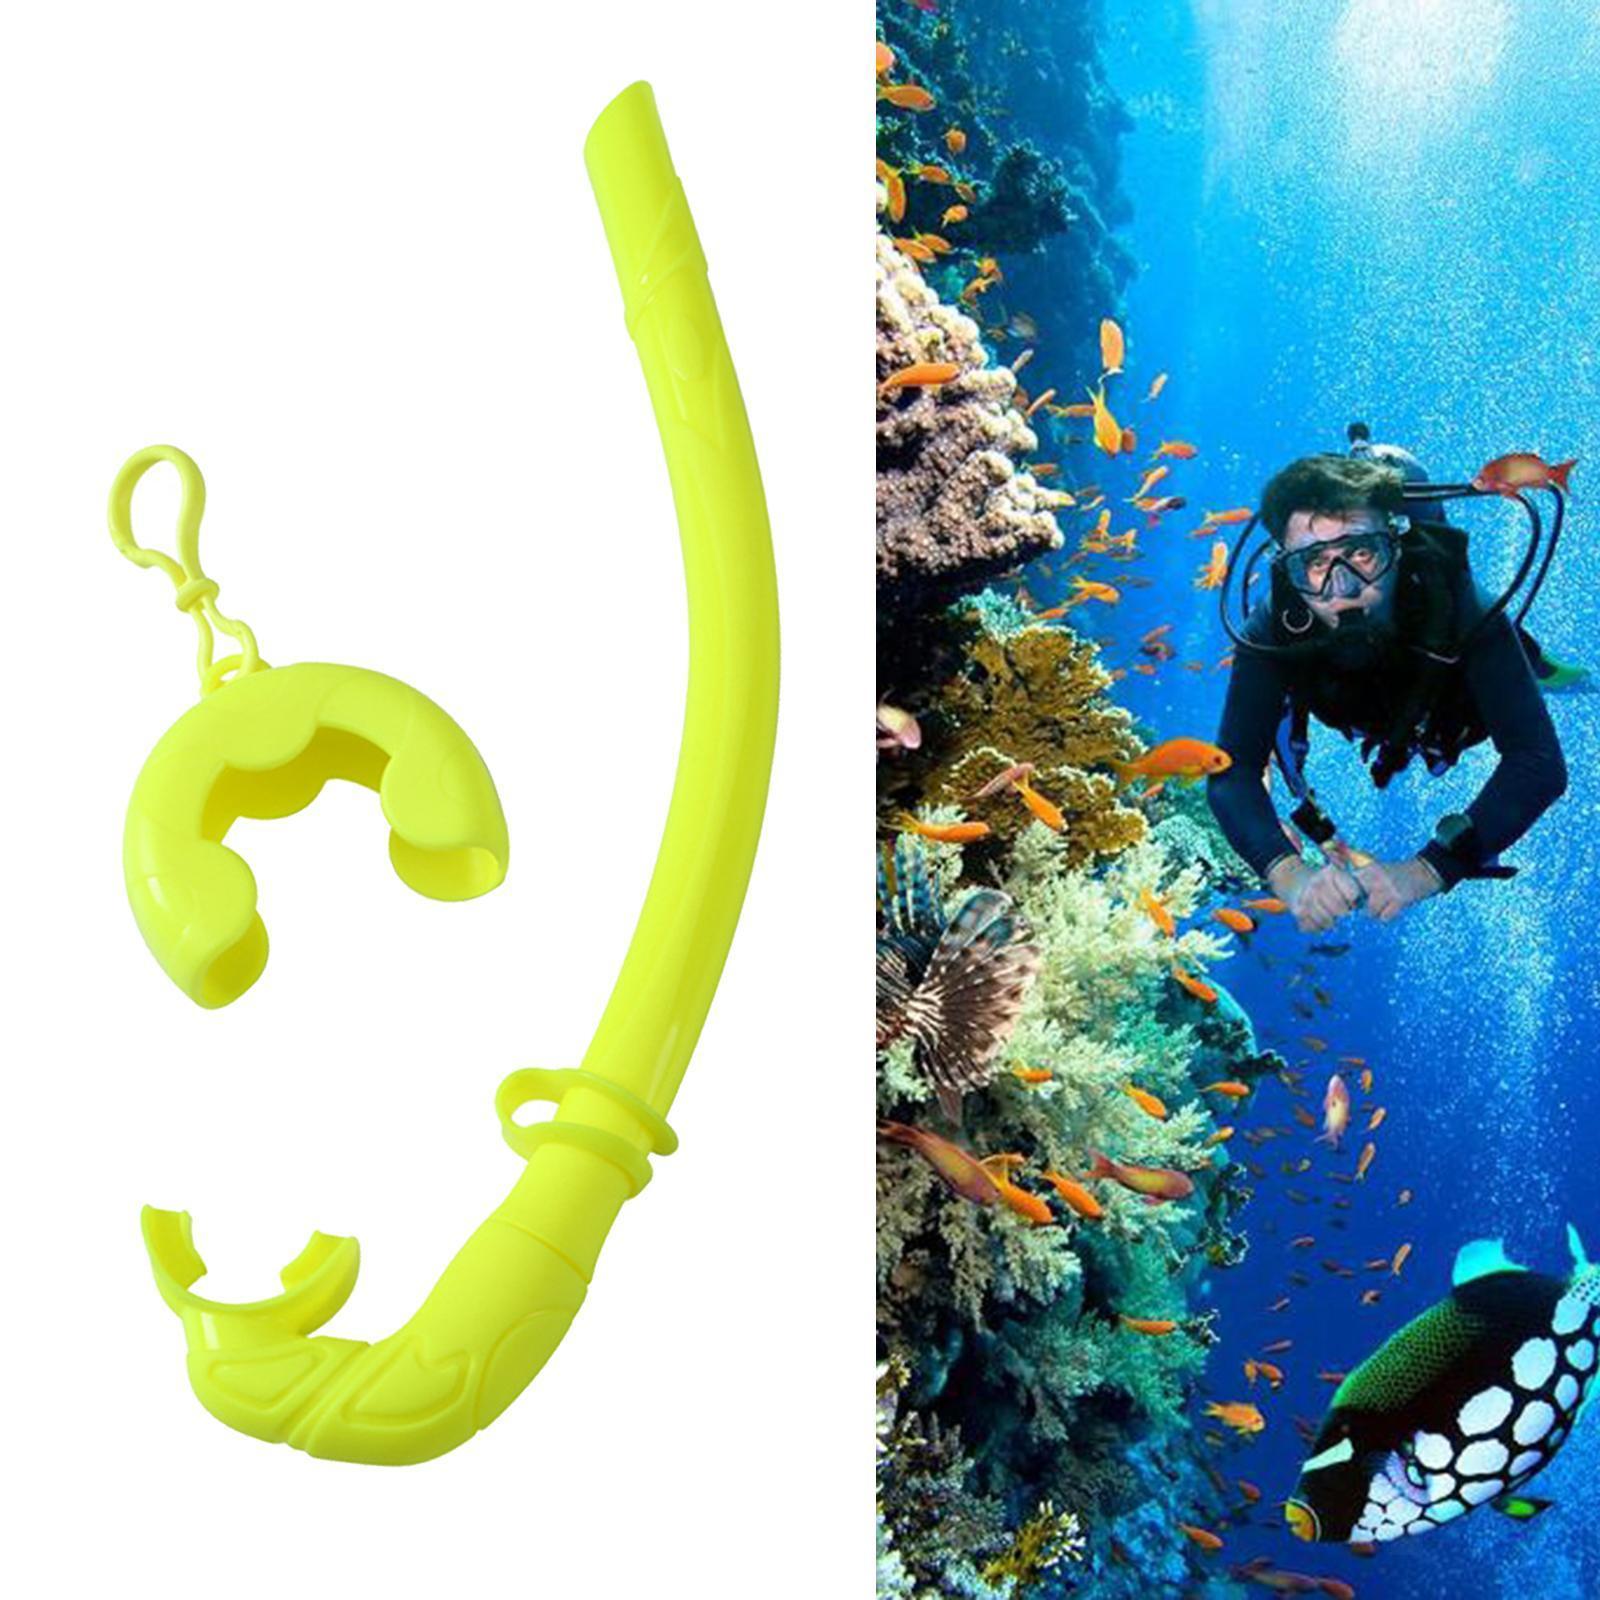 Indexbild 13 - Premium Wet Snorkel Women Men Adults Snorkels Breathing Tube Breath Tube